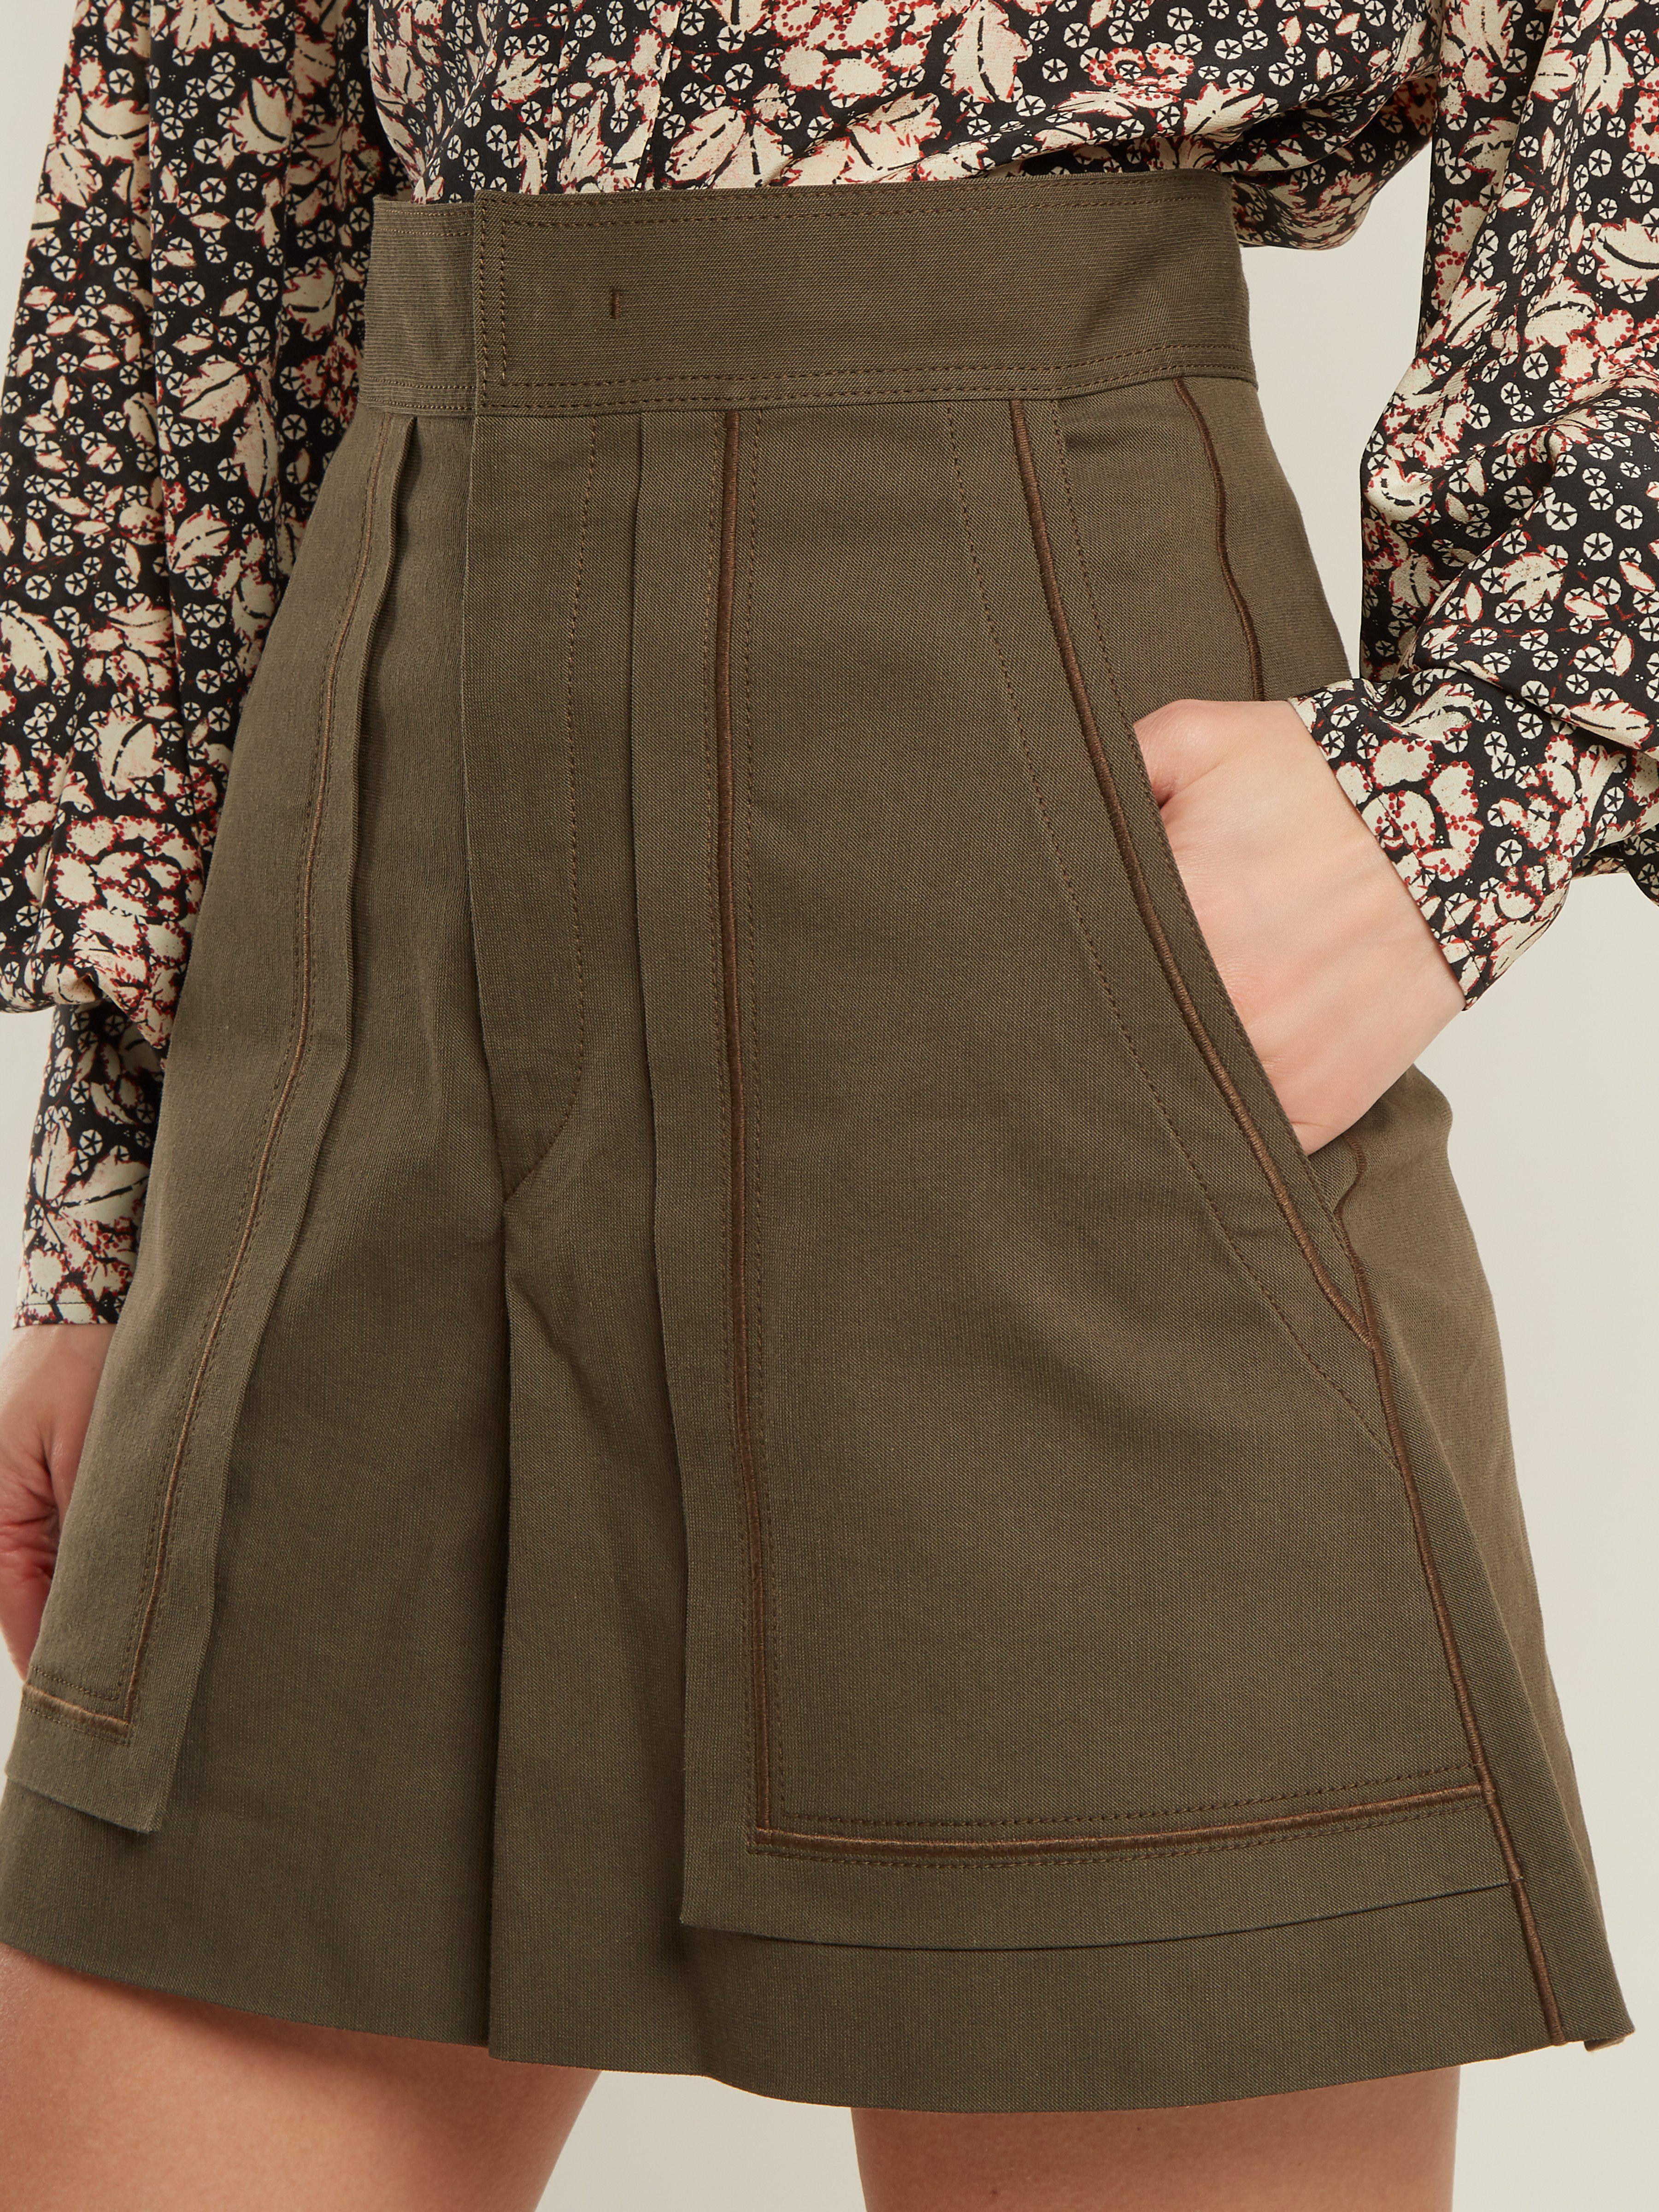 3935bc4ab8 Isabel Marant - Green Lucky A Line High Waist Shorts - Lyst. View fullscreen